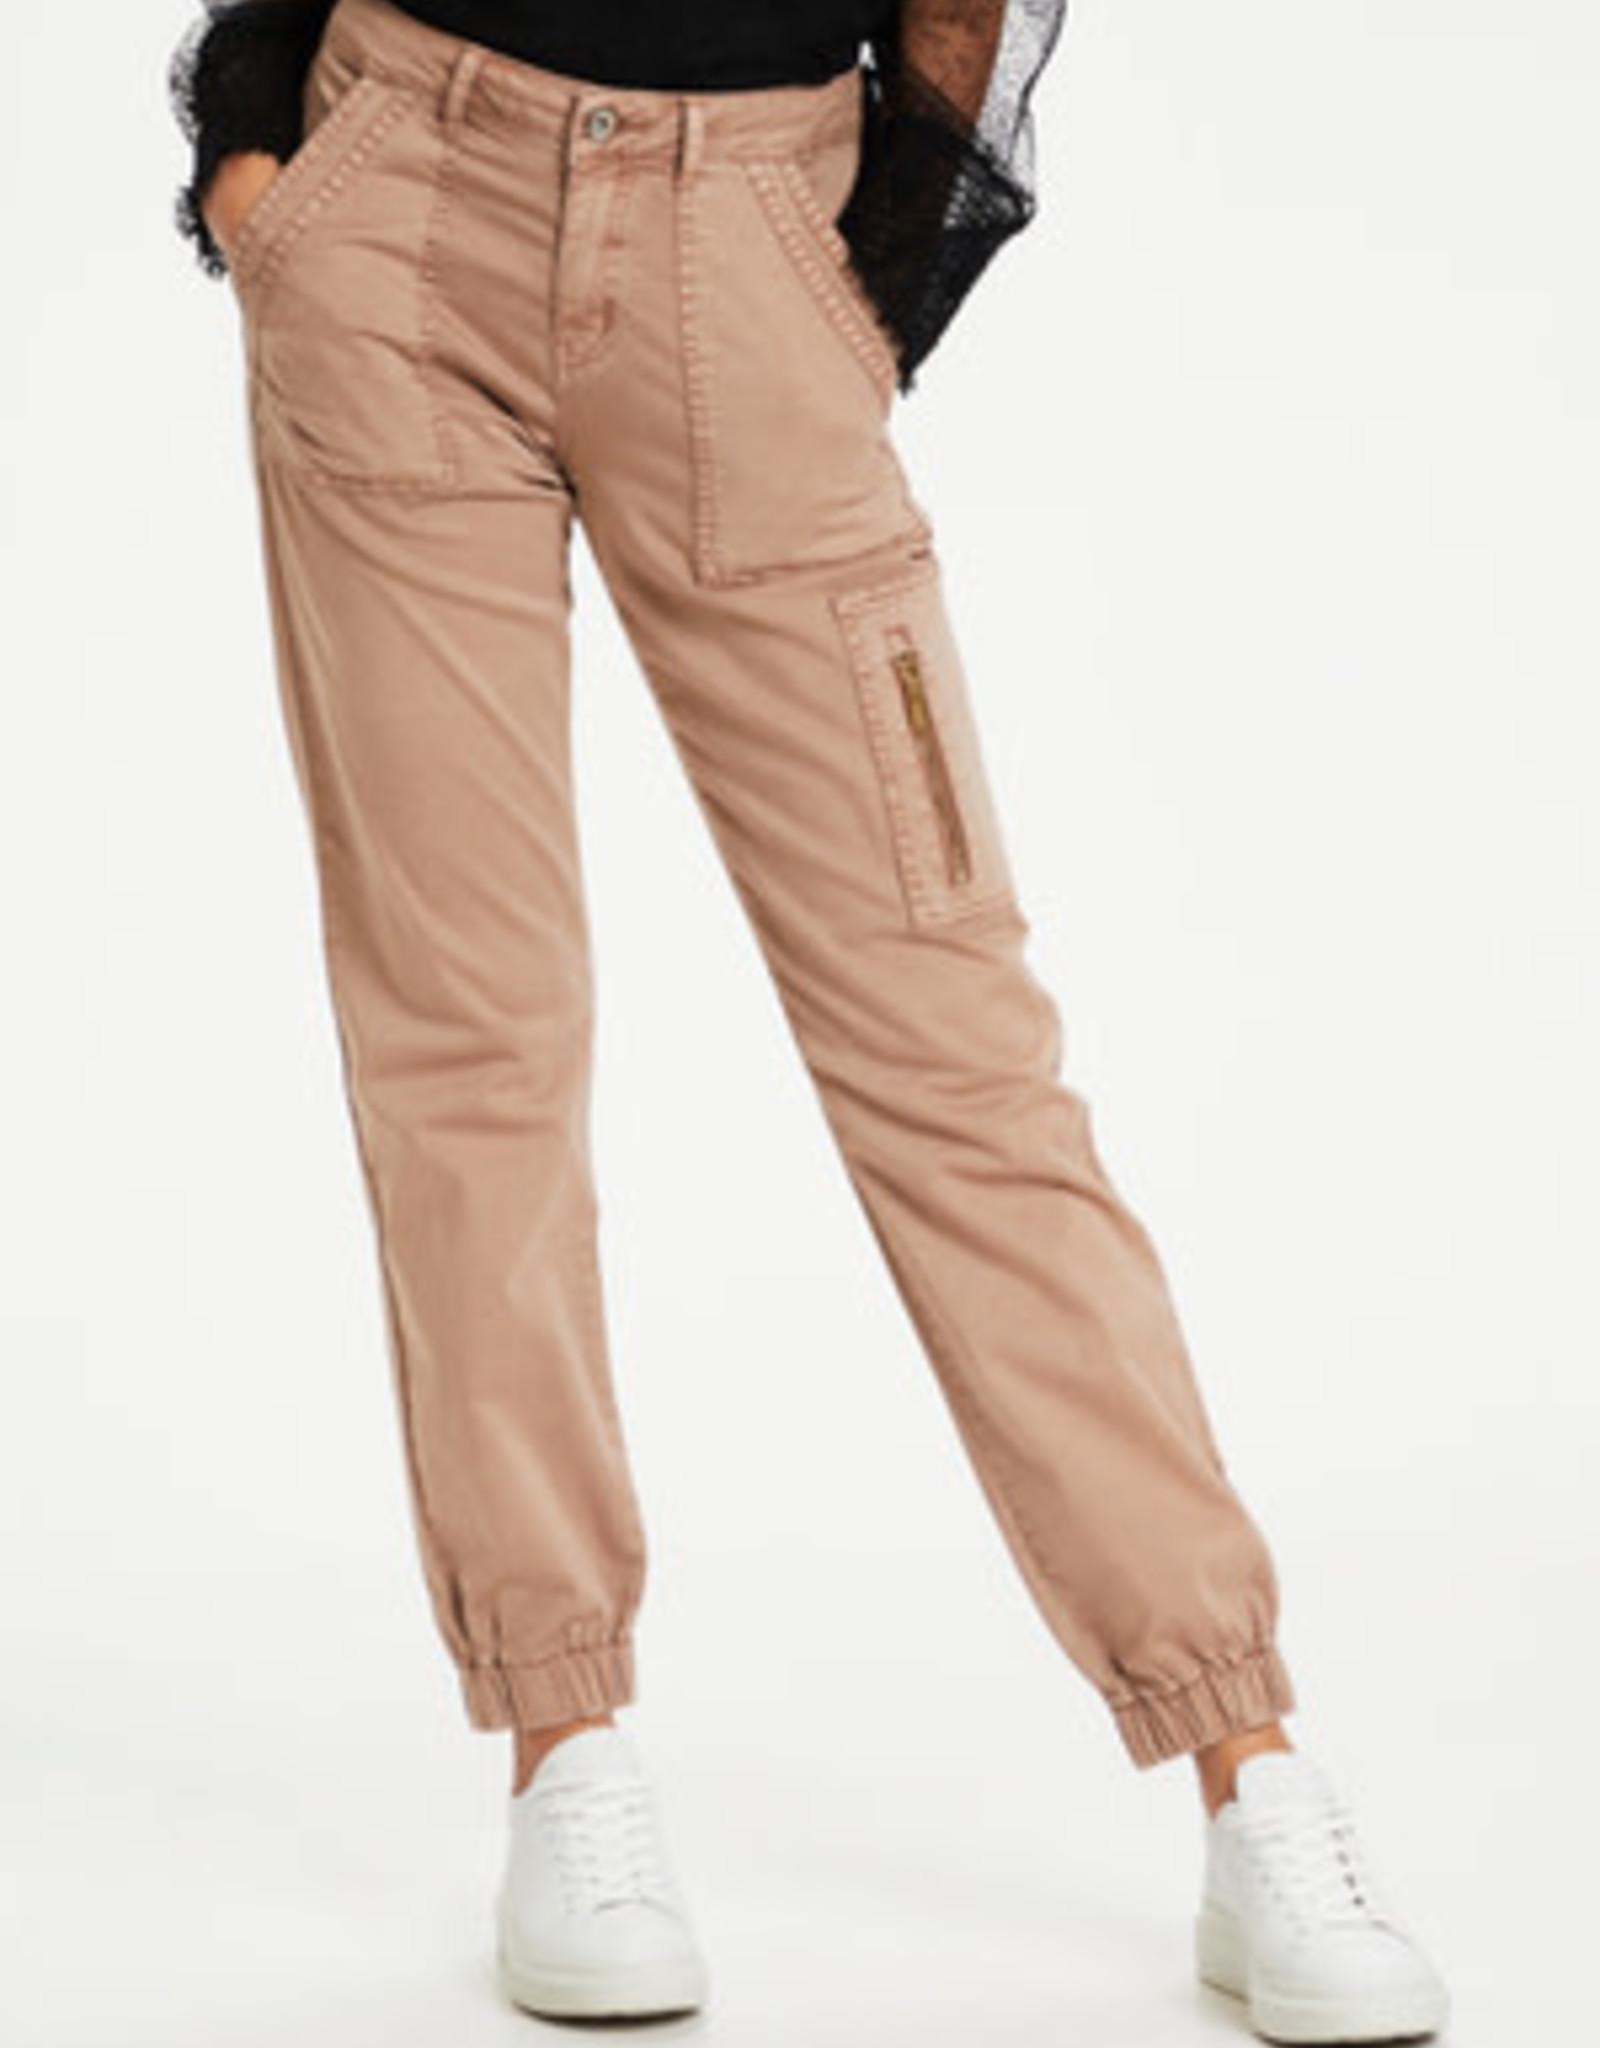 Cream Cream - CRDafnie Jeans - Coco Fit